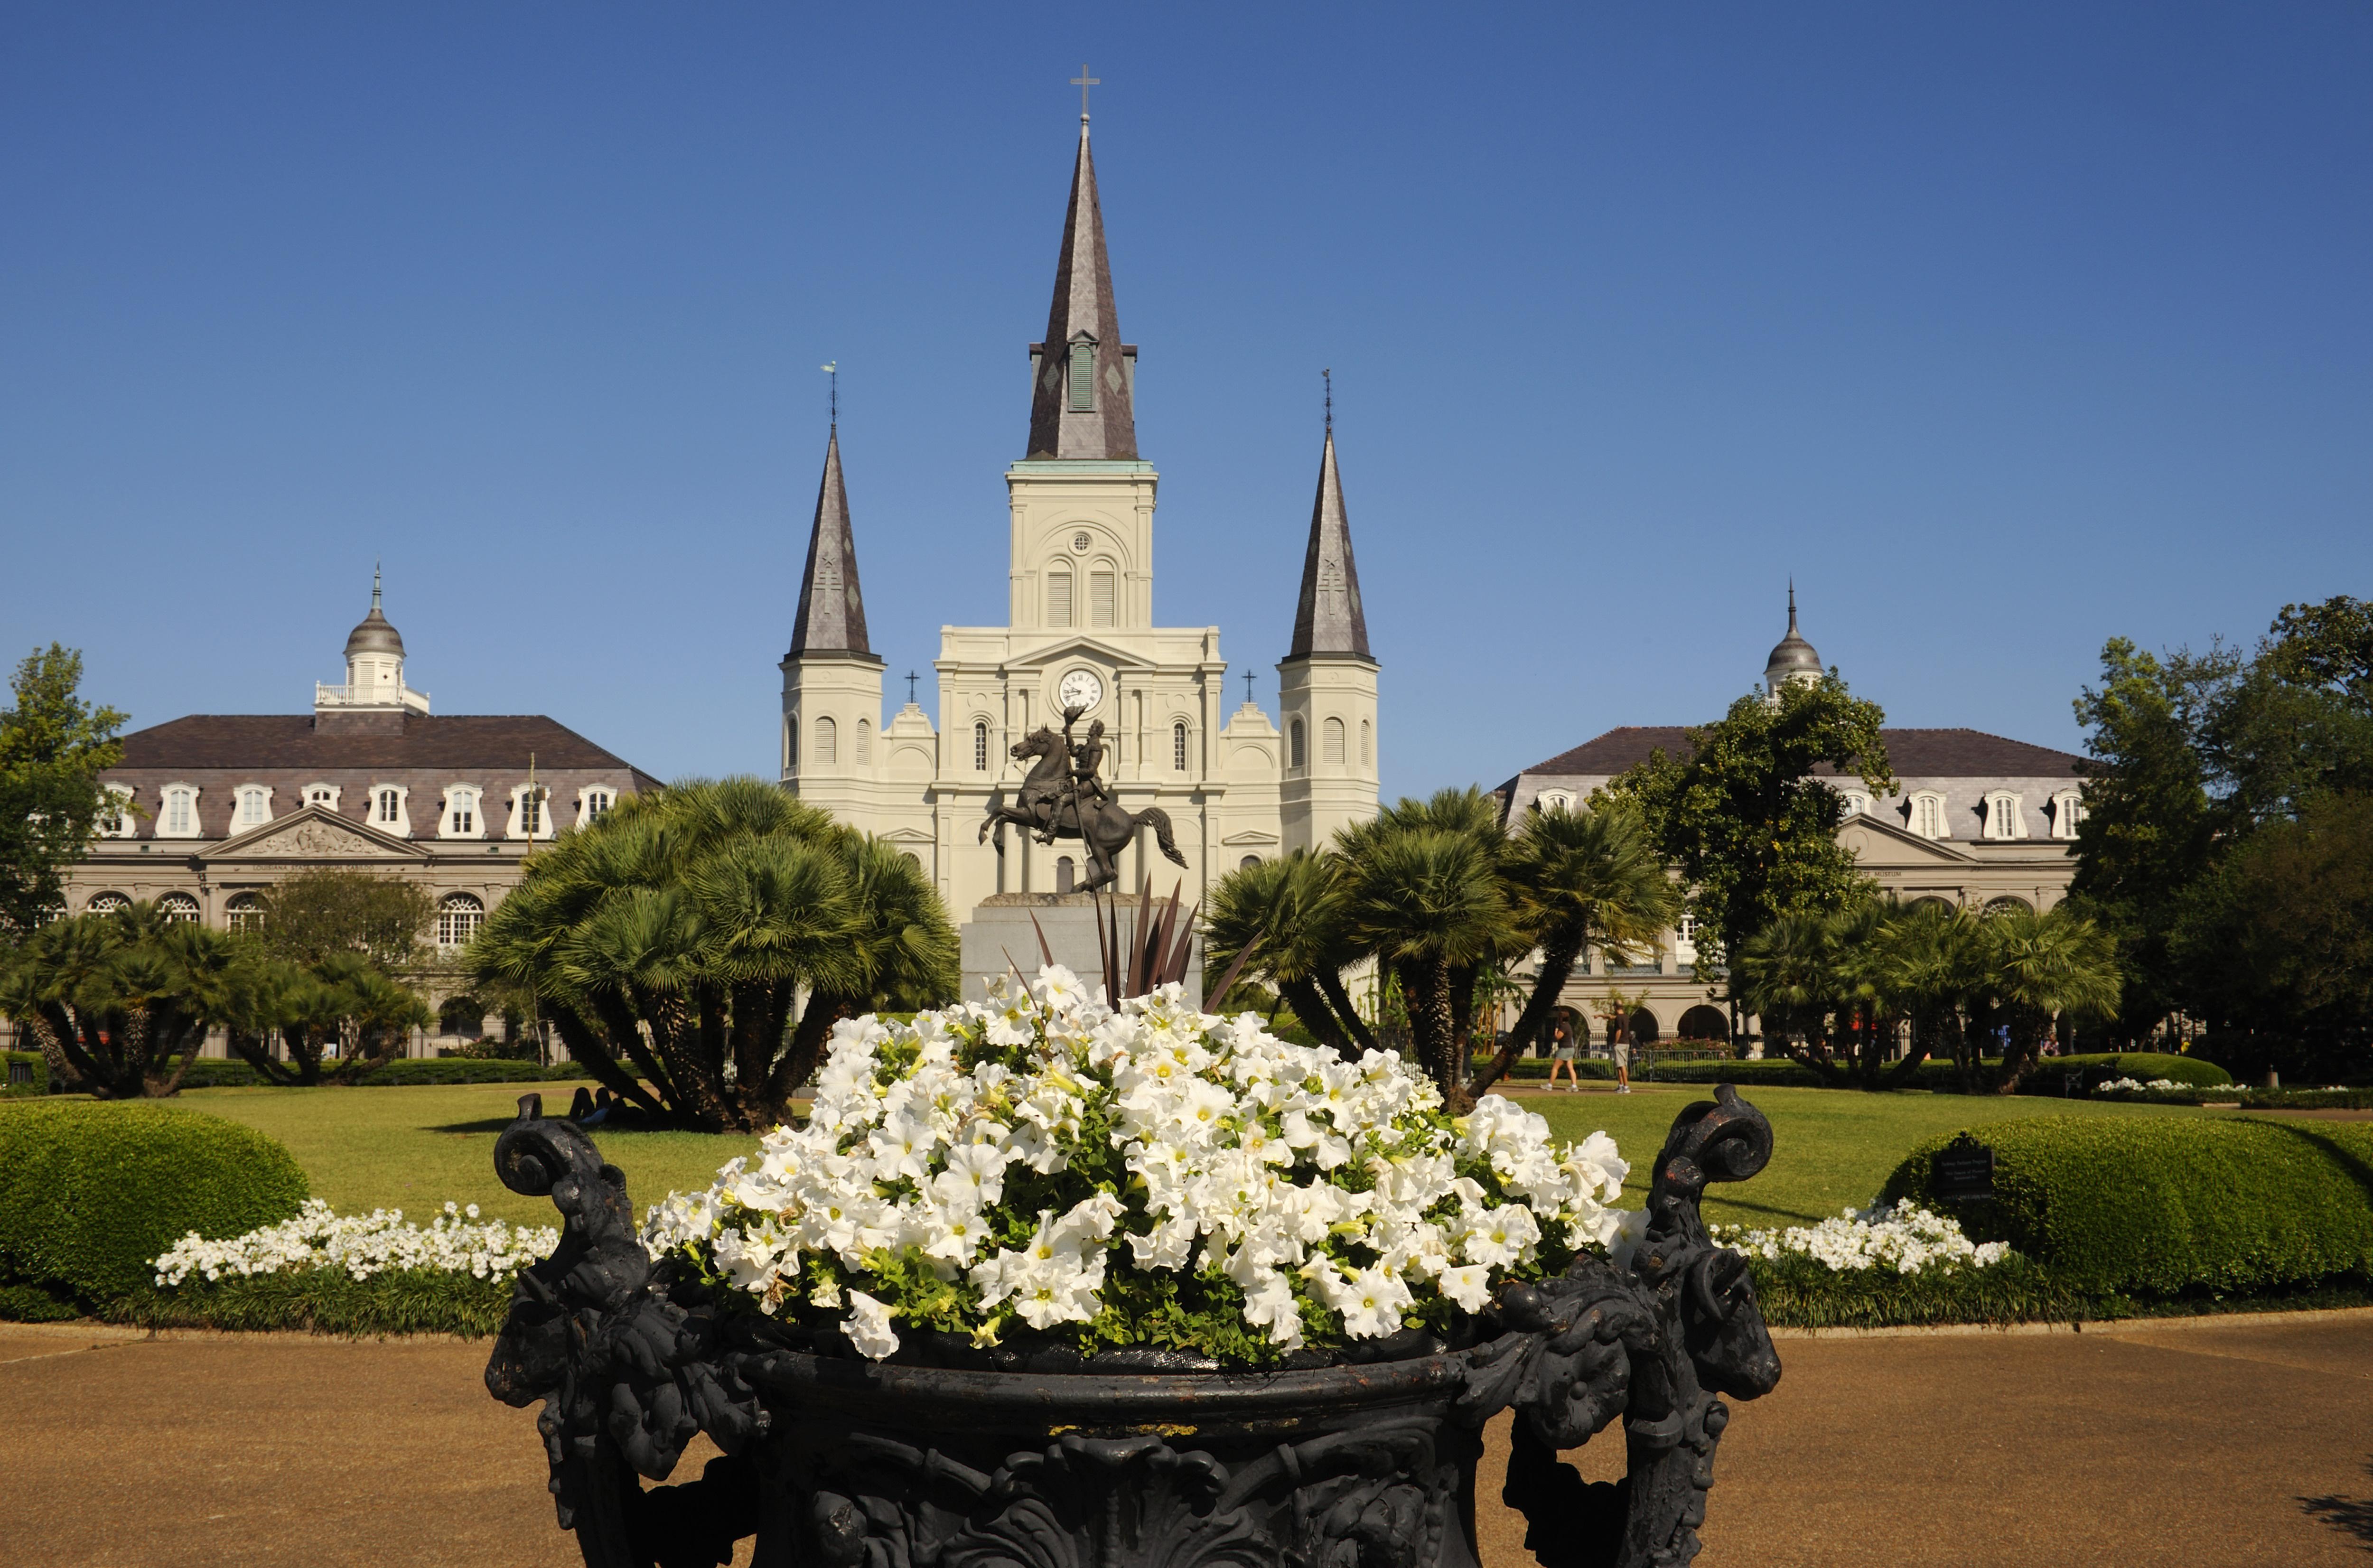 USA, Louisiana, New Orleans, French Quarter, Jackson Square...